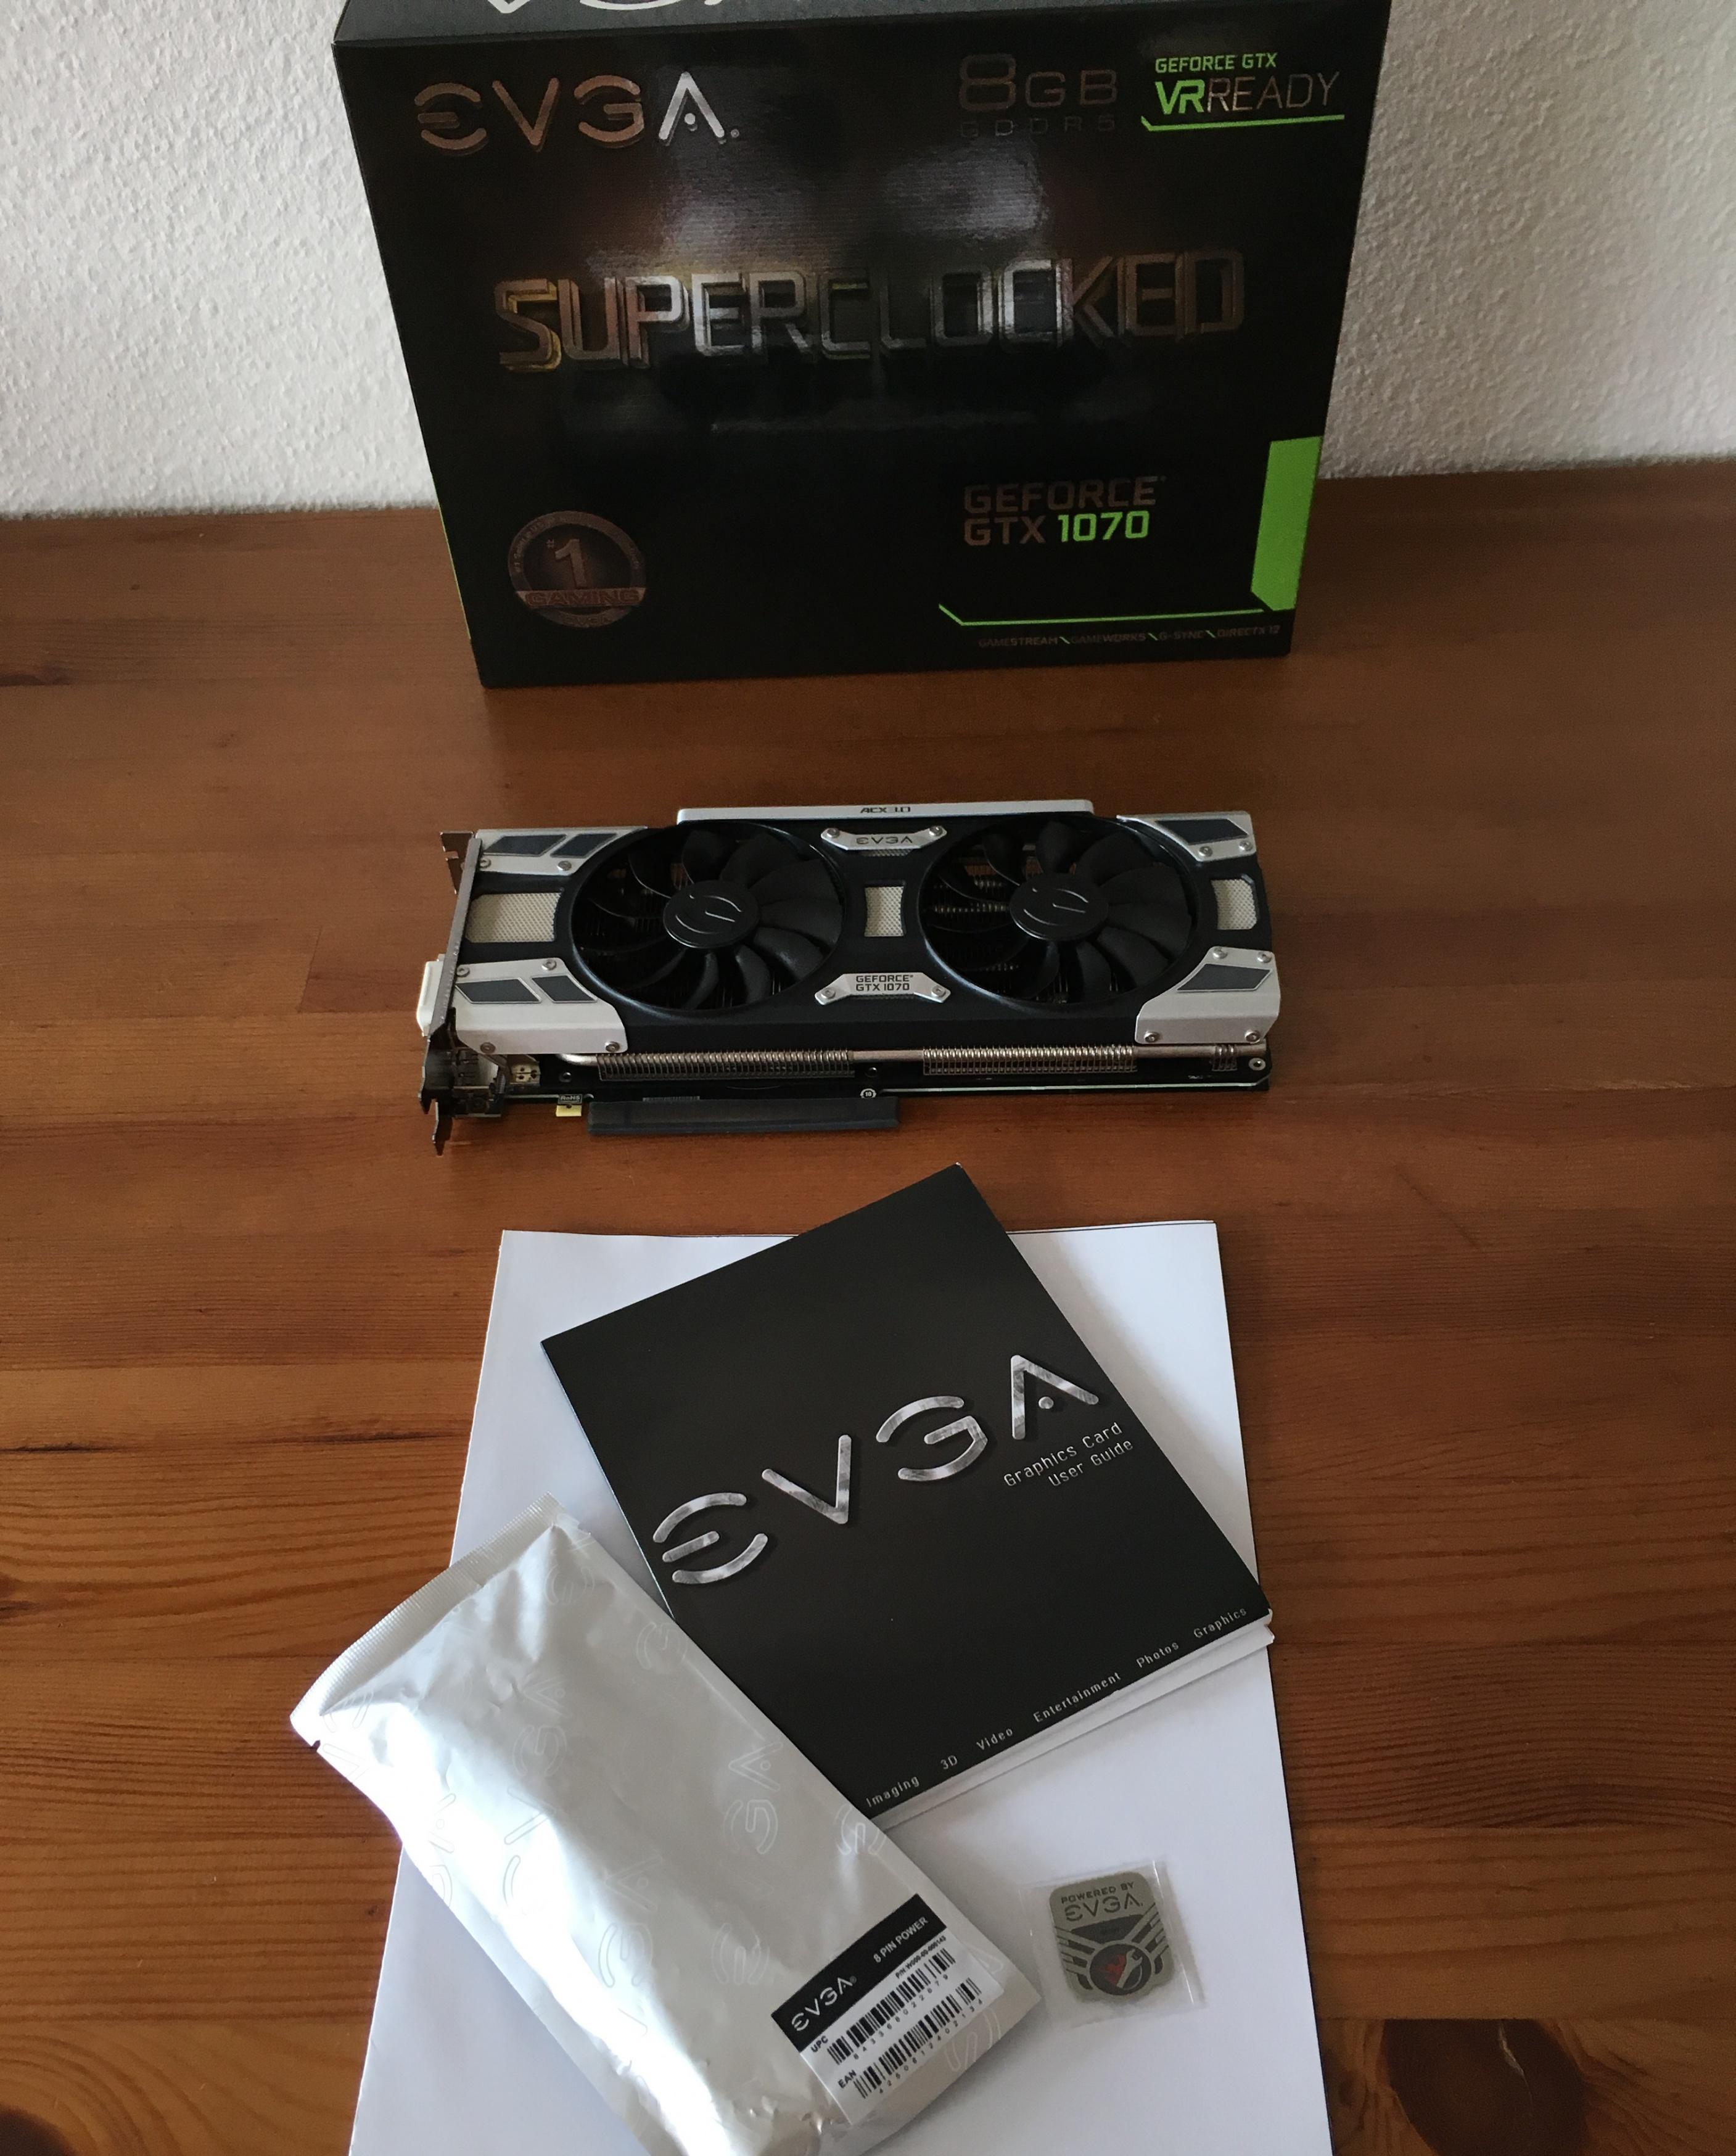 REVIEW] EVGA GeForce GTX 1070 SC Gaming ACX 3 0 - EVGA GTX